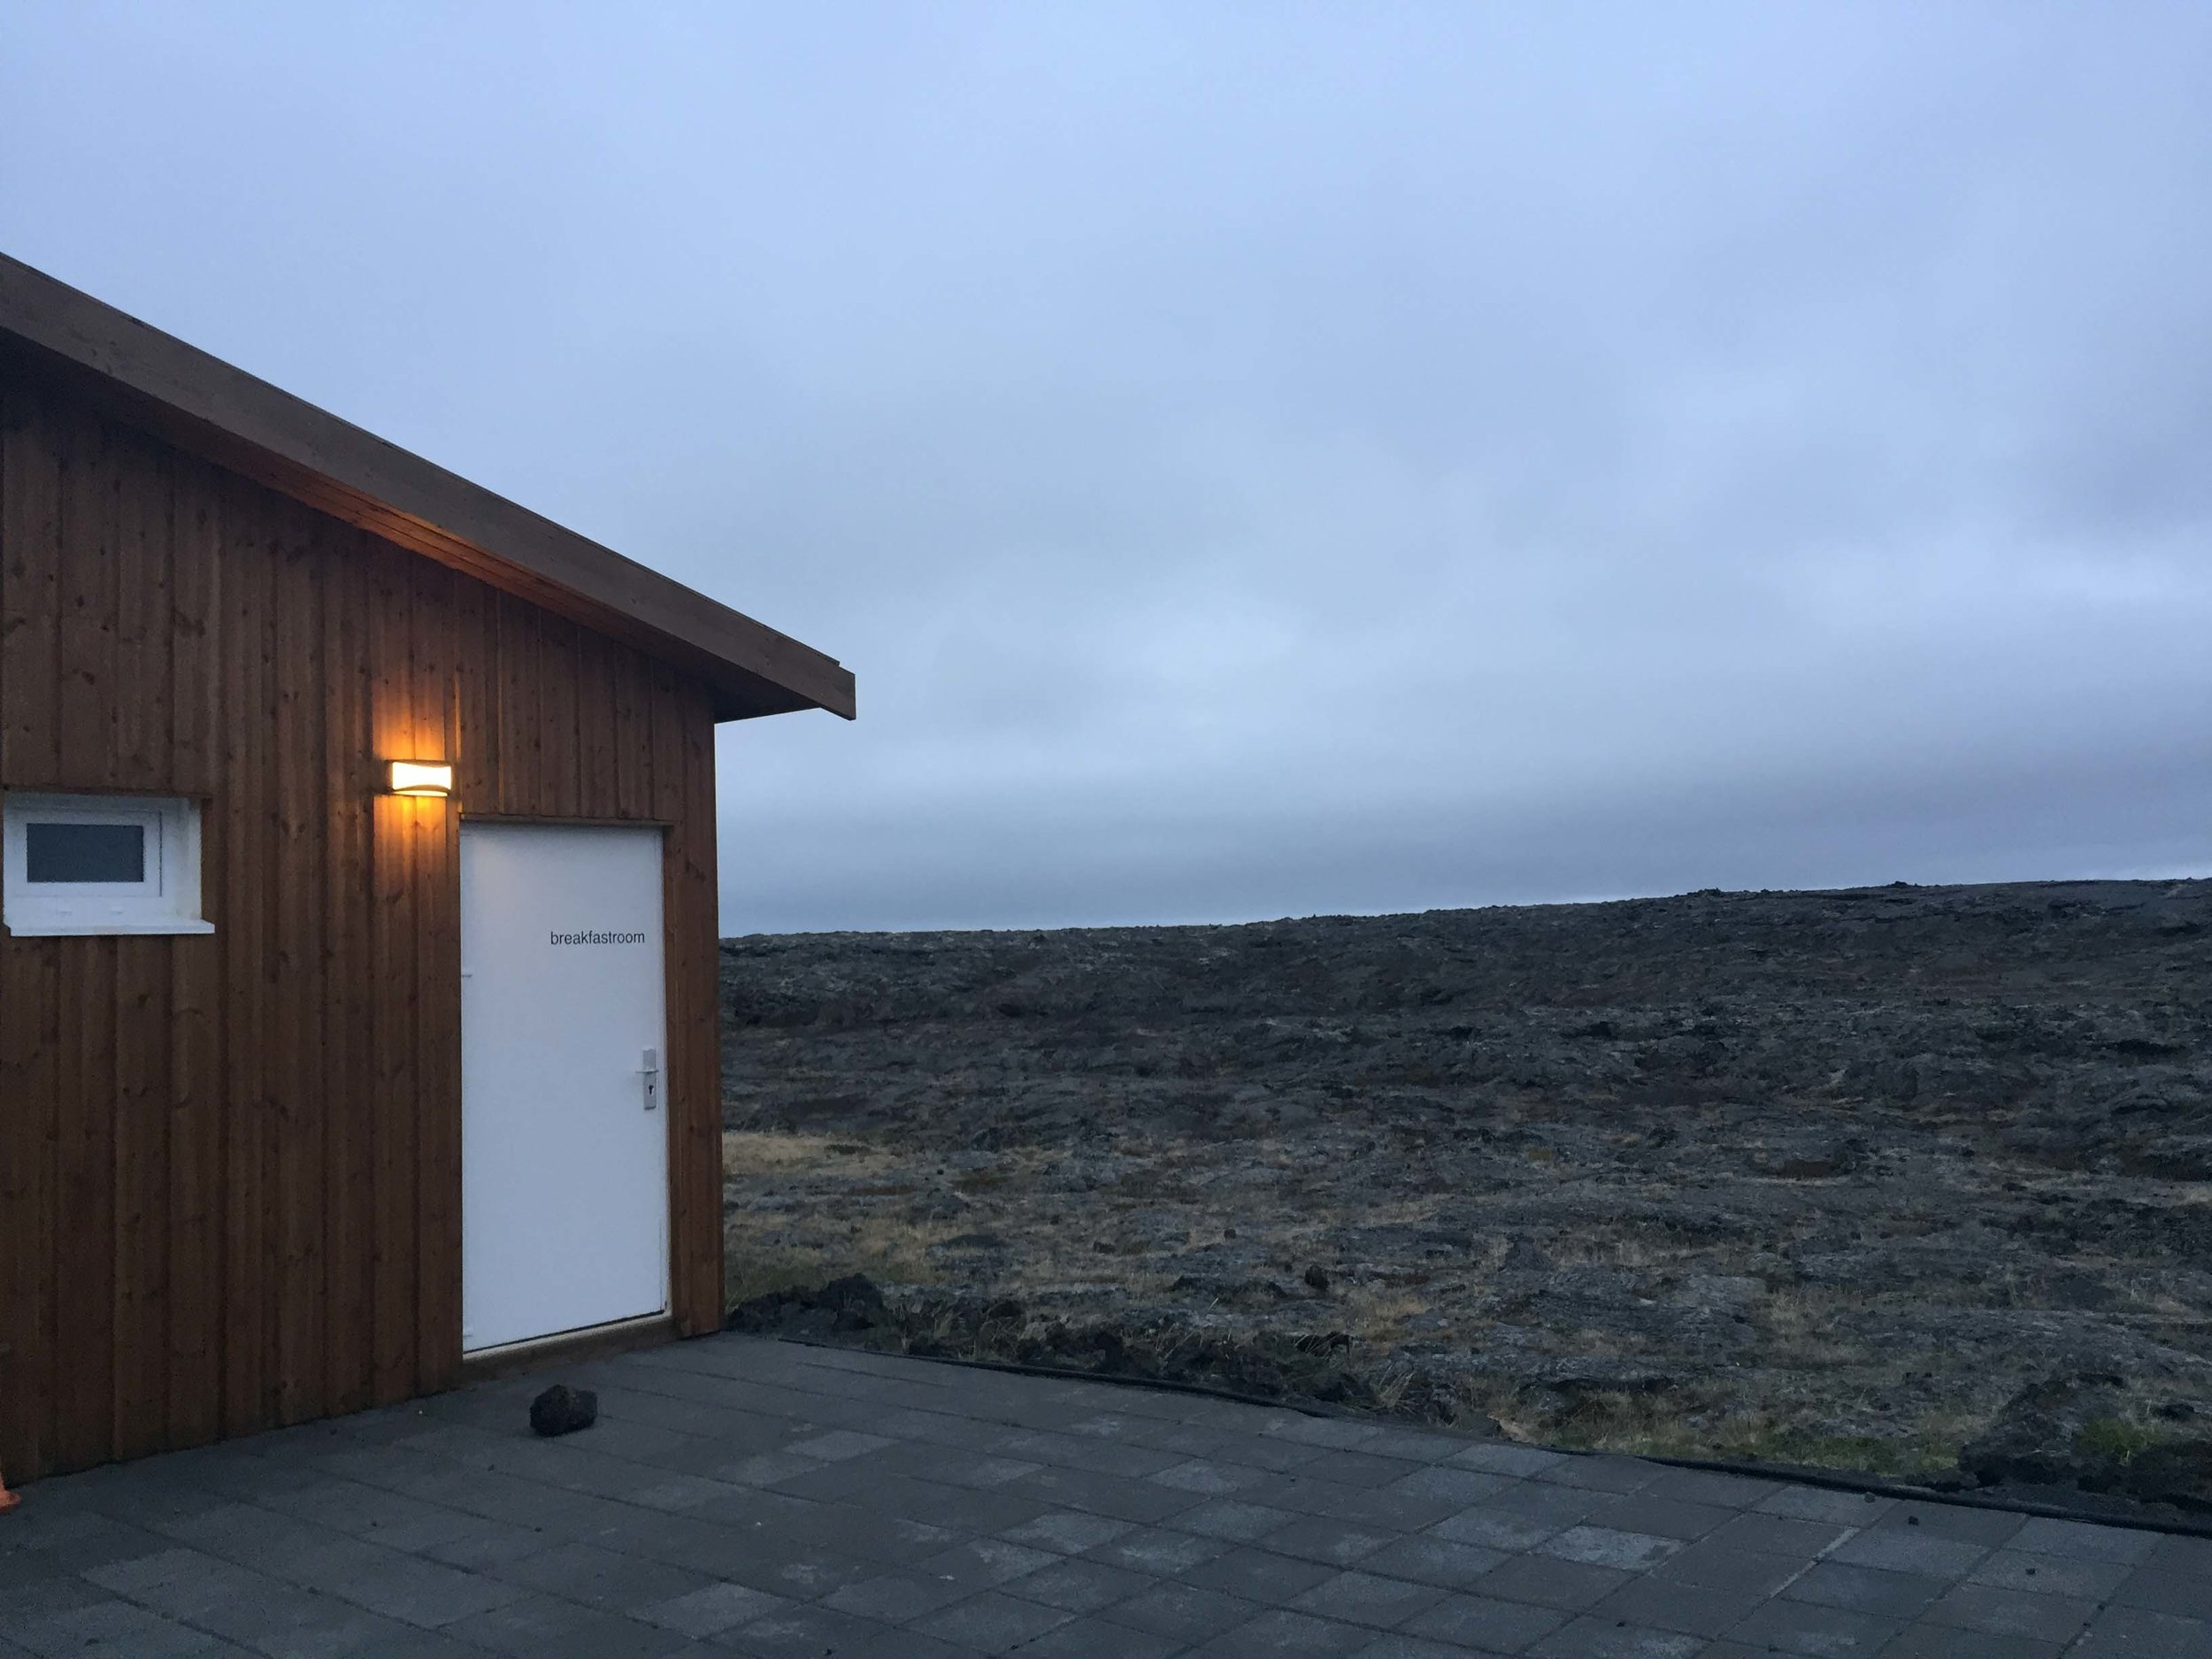 Lunar terrain Iceland